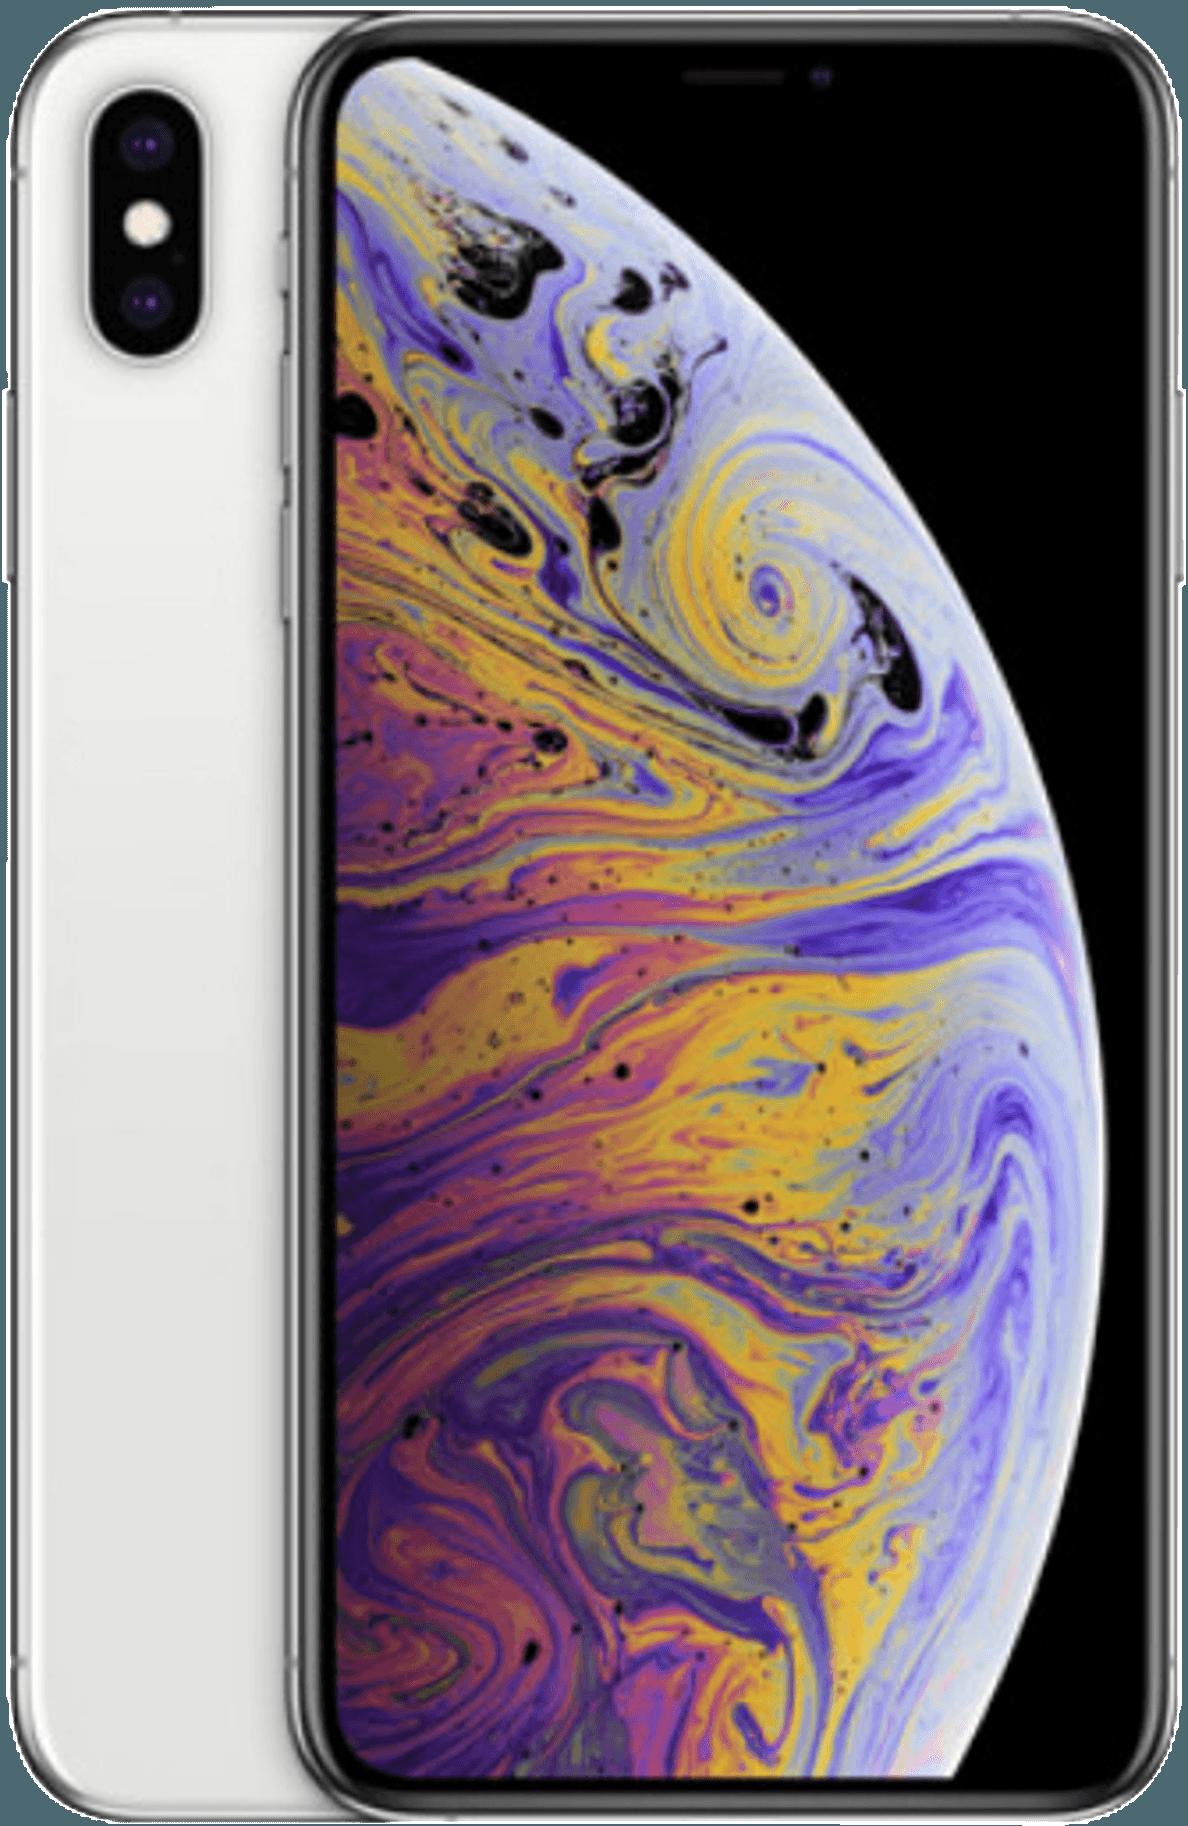 Iphone Xs Max Smartphone 256 Gb Silber 00190198784643 Apple Iphone Xs Max Smartphone 256 Gb Silber Technik Noteb Apple Iphone Iphone Handy Iphone